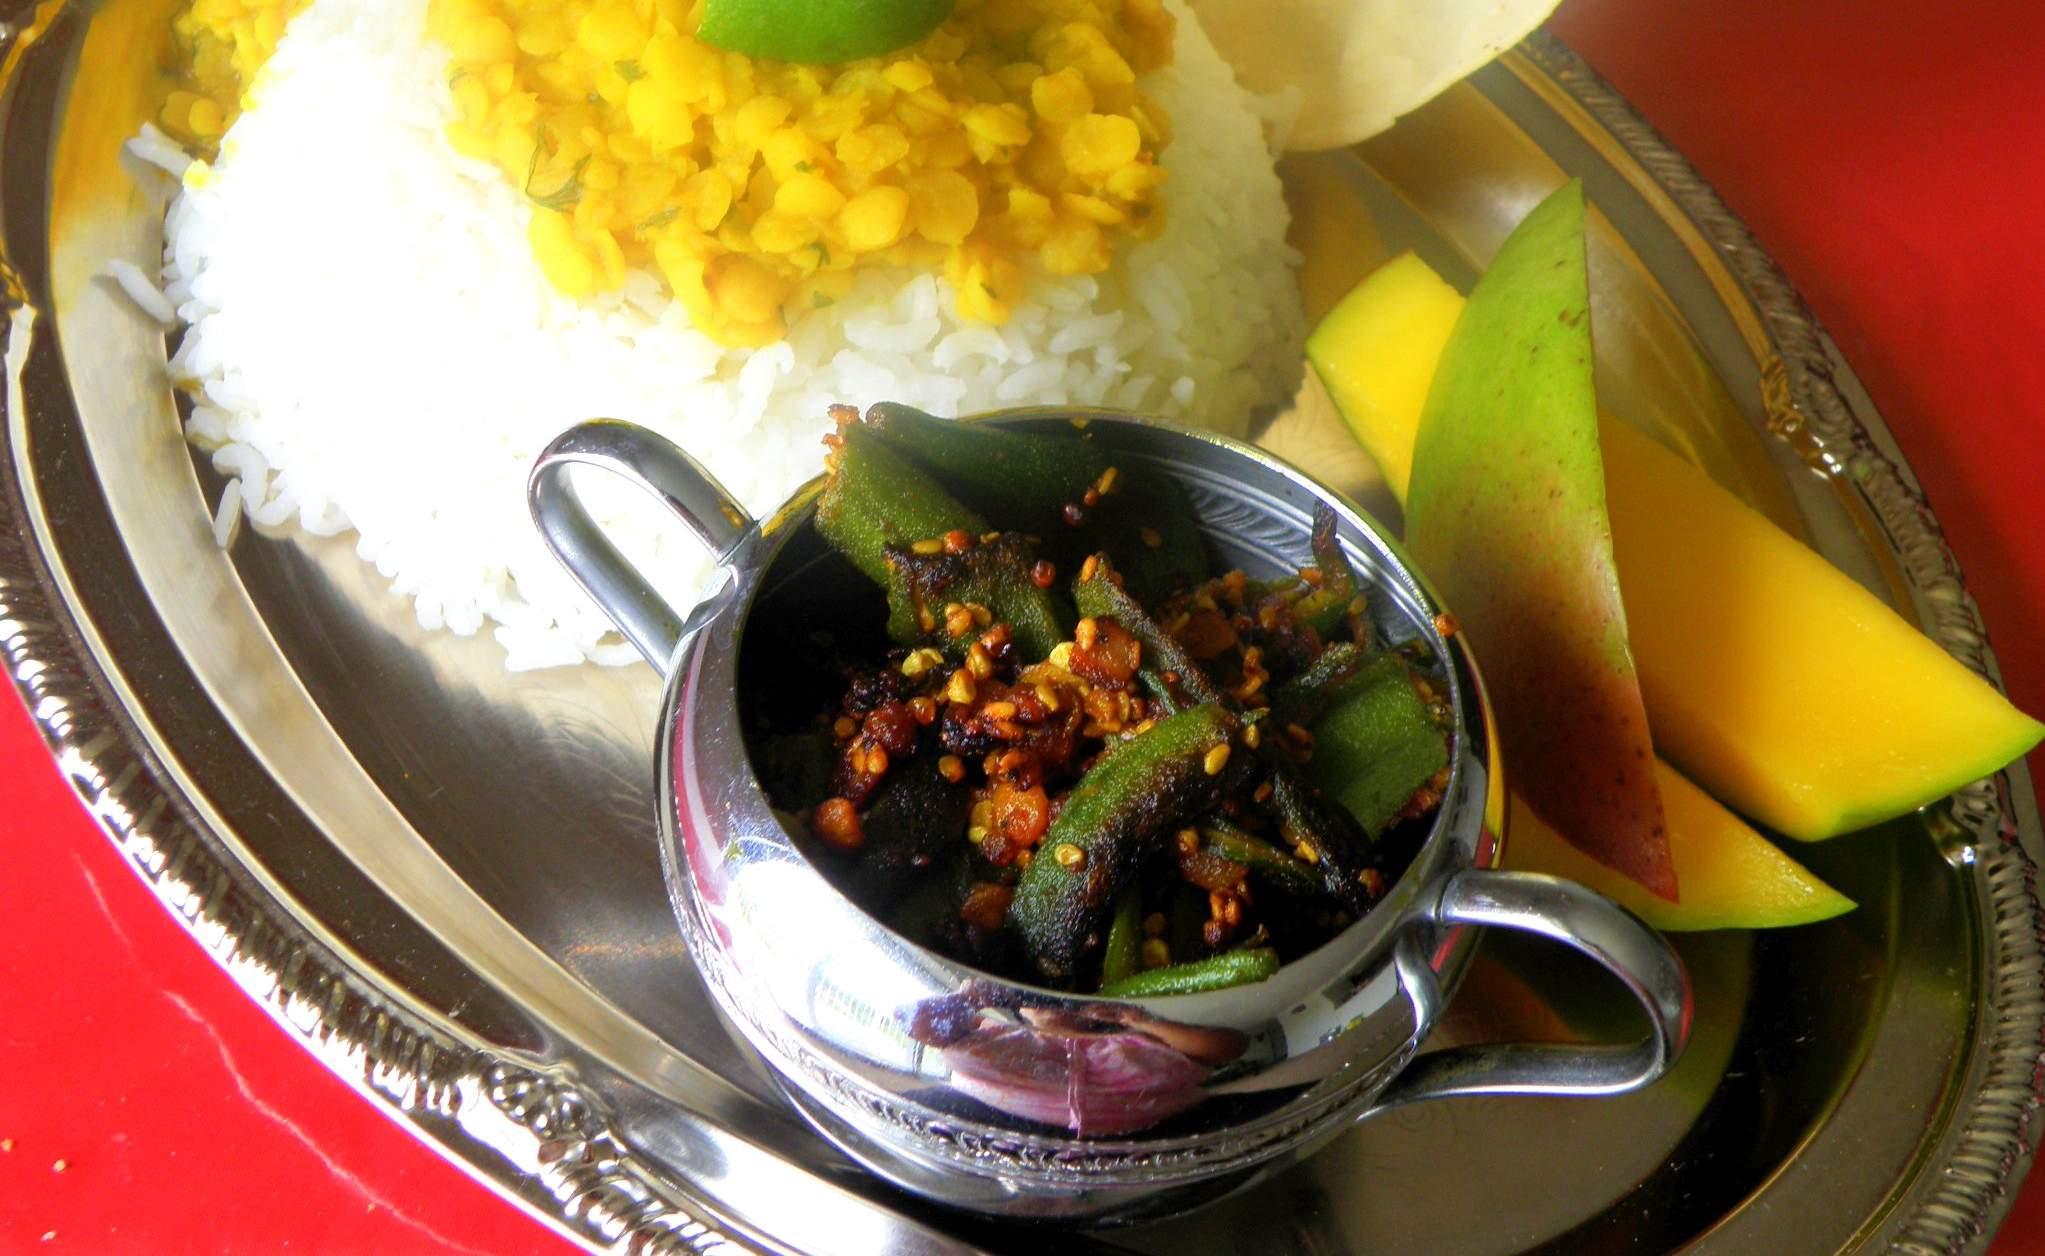 Home smis bengali recipes bengali recipe bengali food forumfinder Image collections